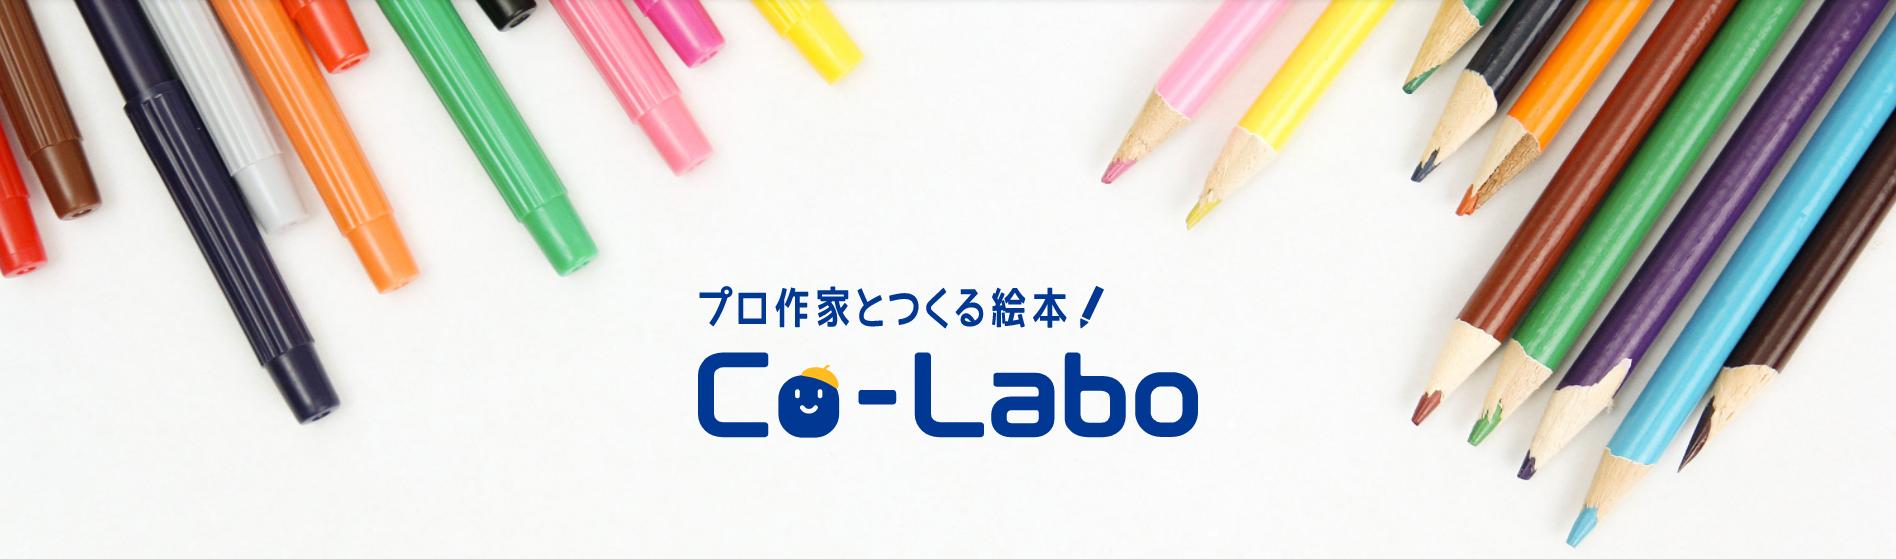 https://www.colabo-ehon.com/